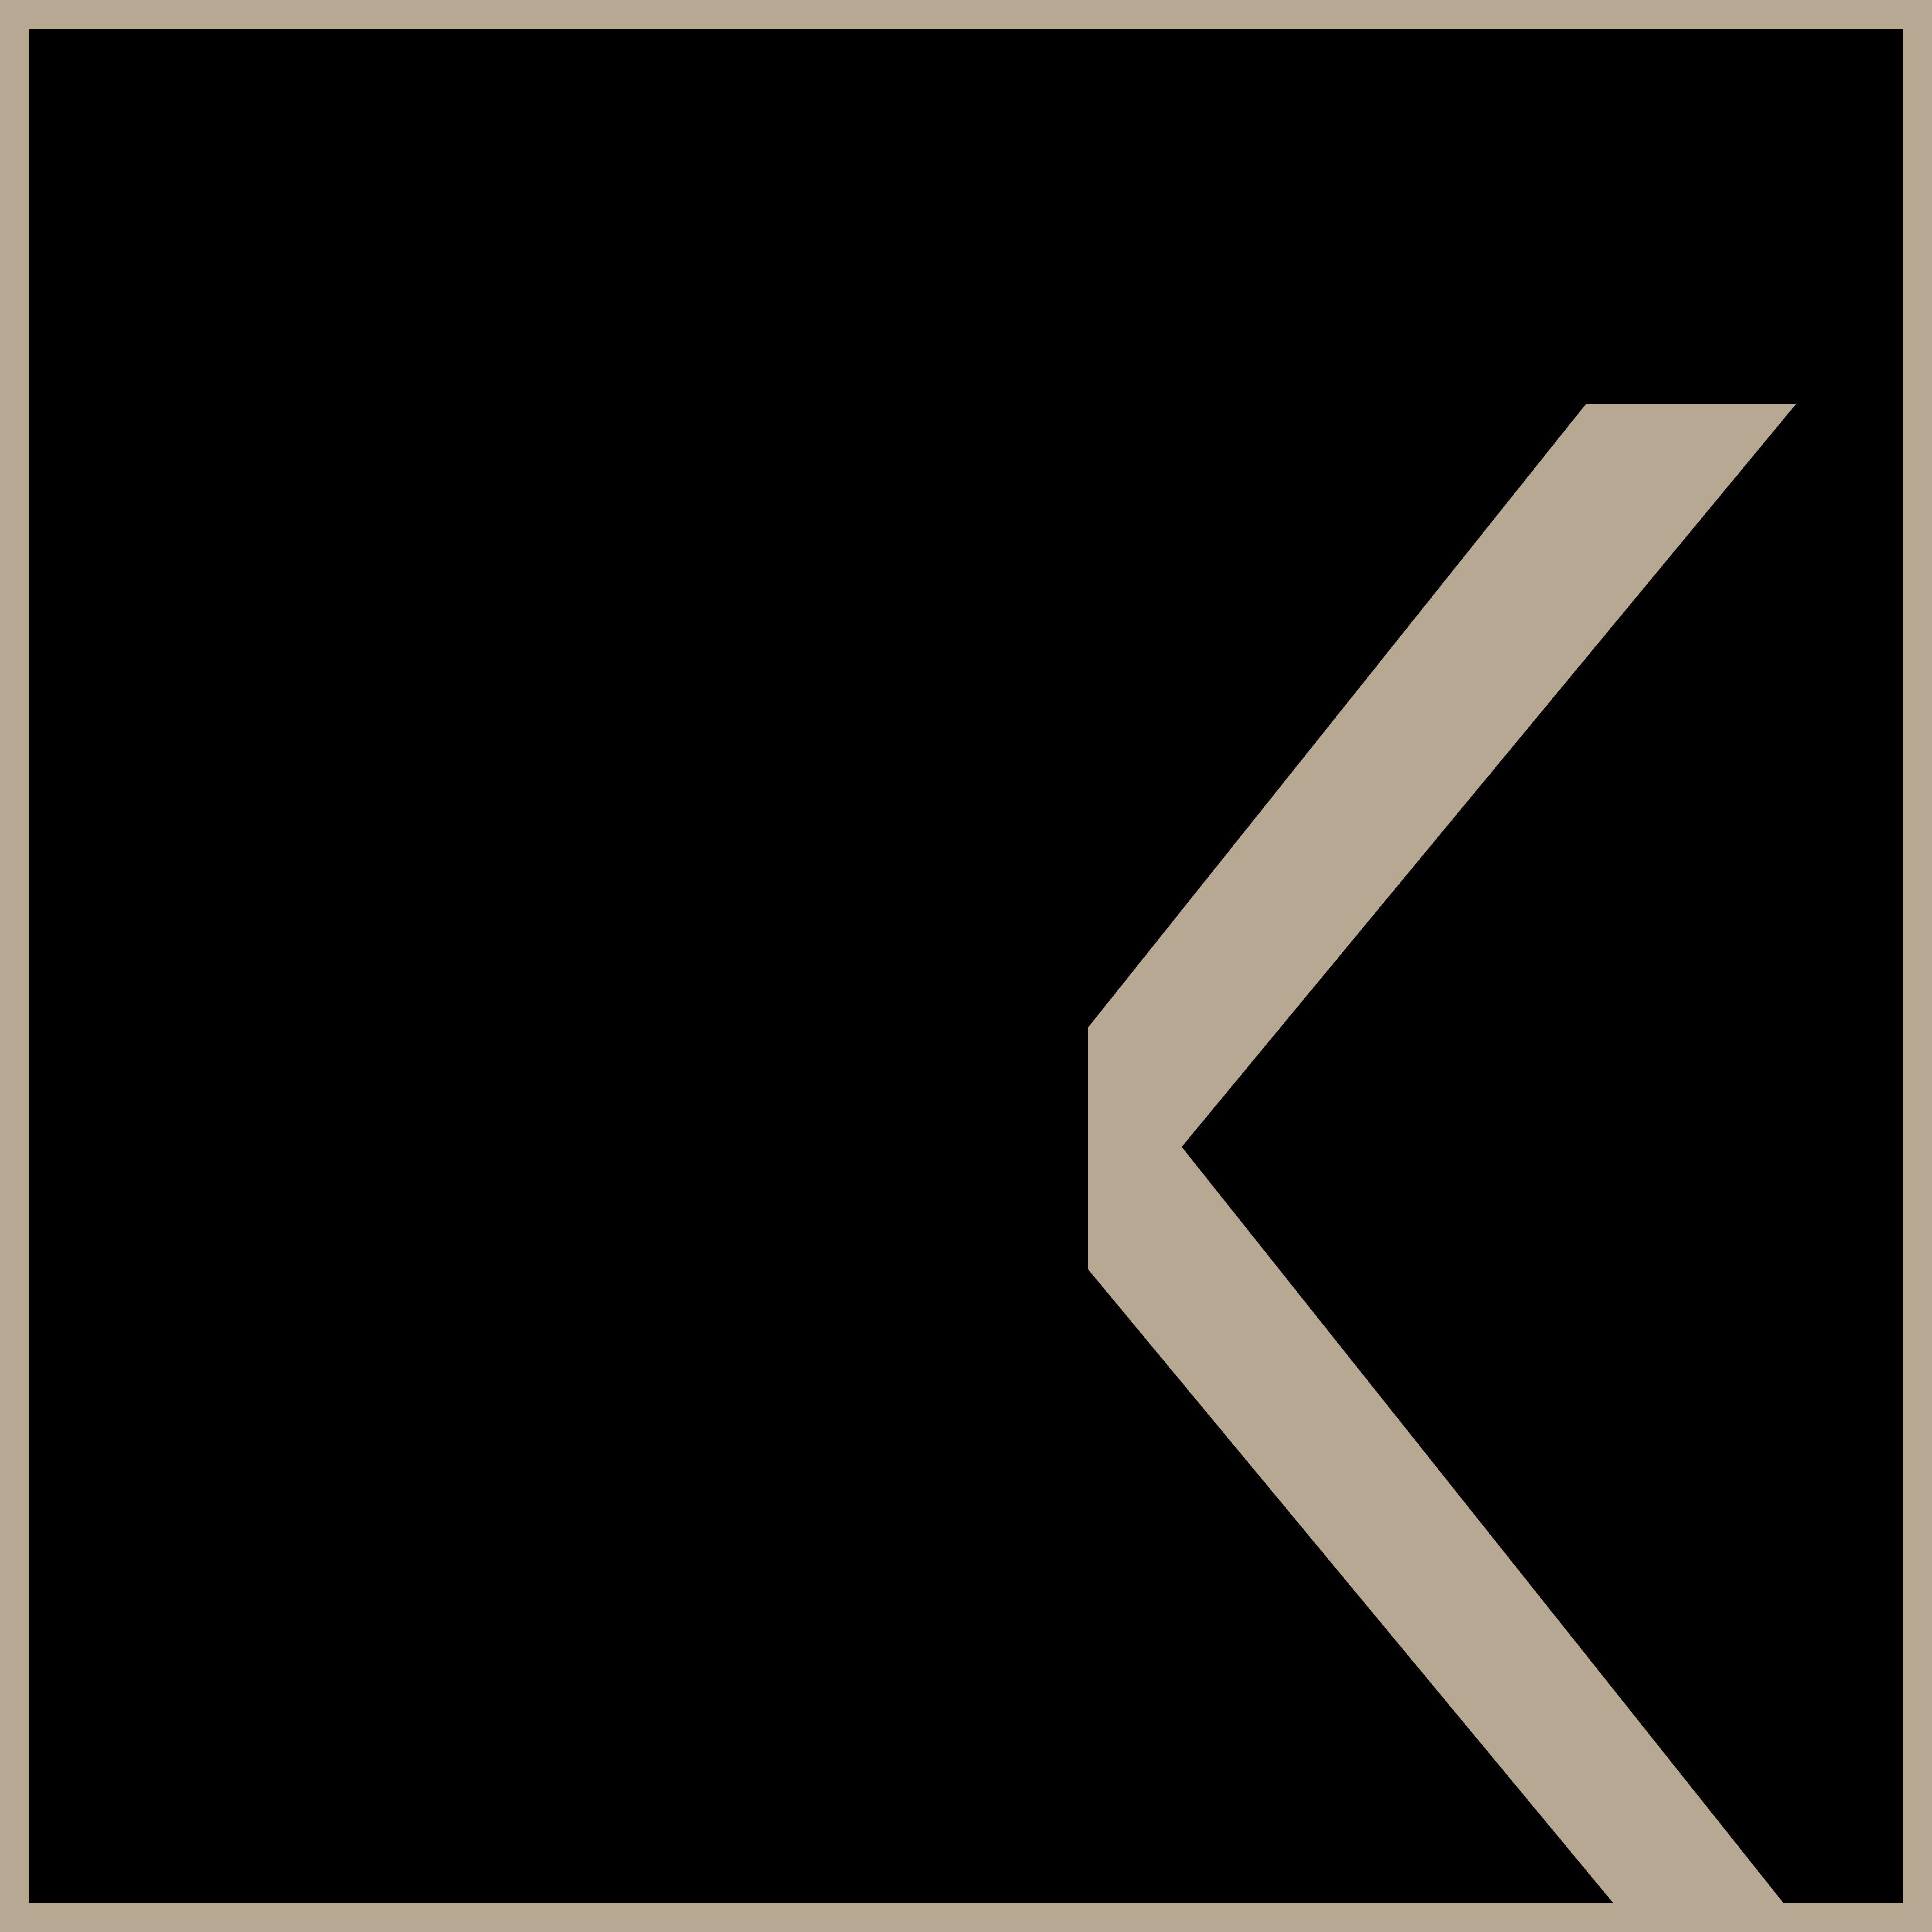 Alfabeto PNG Area 51 BIS (21 Maggio 2021) K